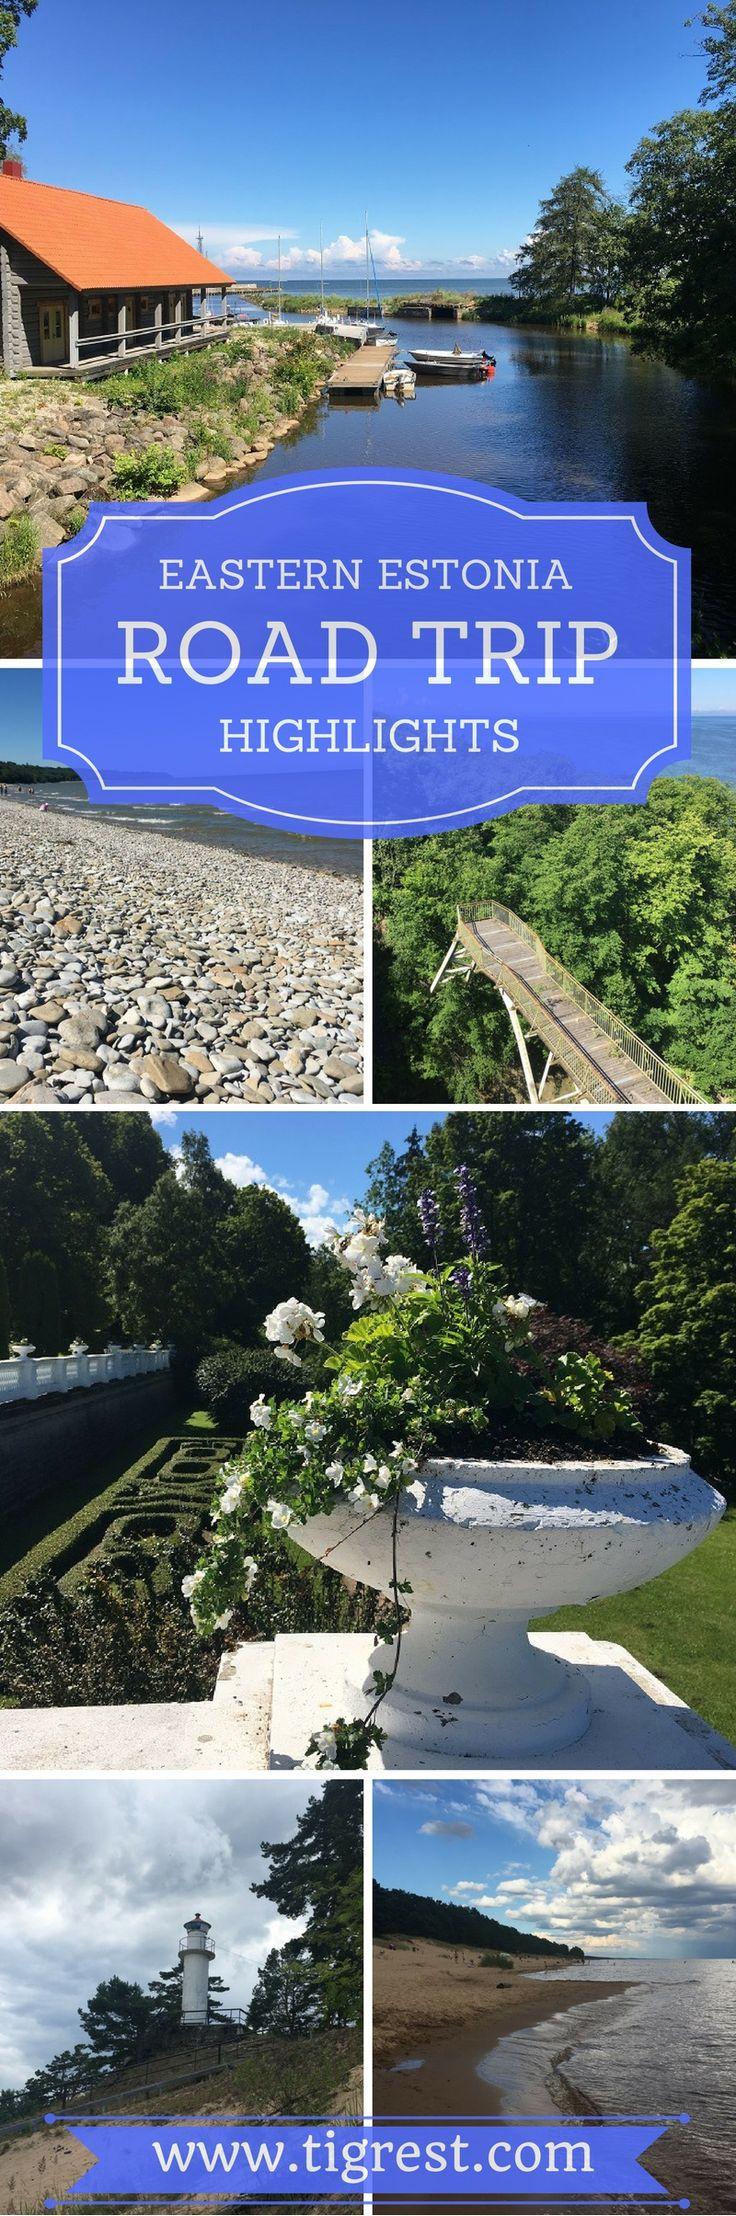 Exploring Eastern Estonia - one day road trip to Ontika, Toila and Oru Park, Blue Hills museum and war cemetery, lake Peipus and Kauksi beach